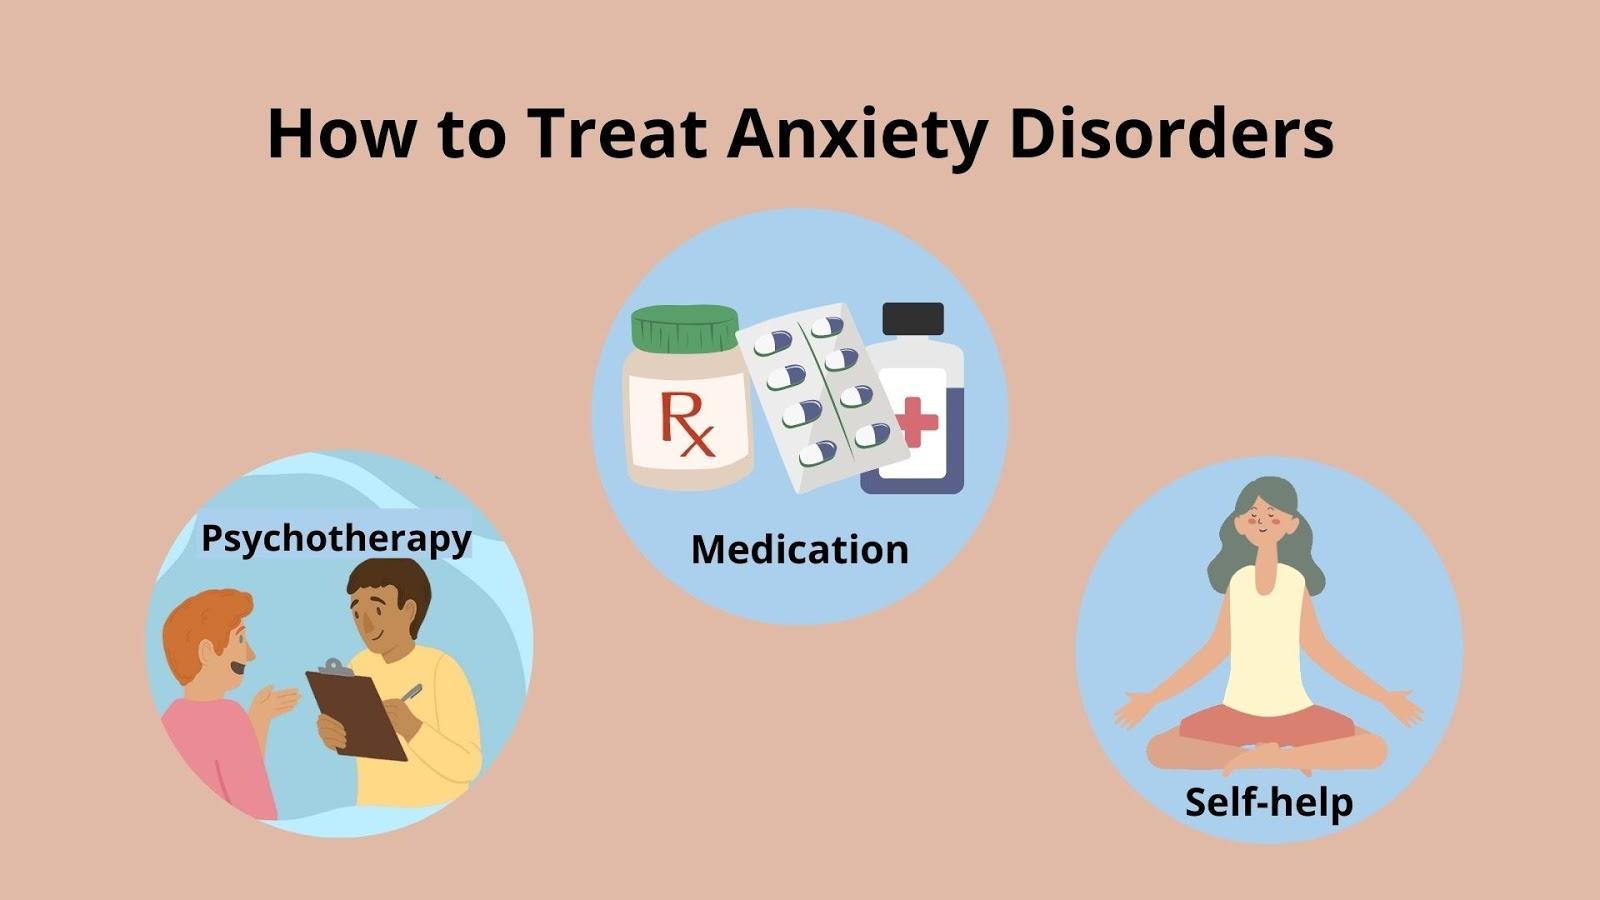 How to Treat Anxiety Disorders ichhori.com